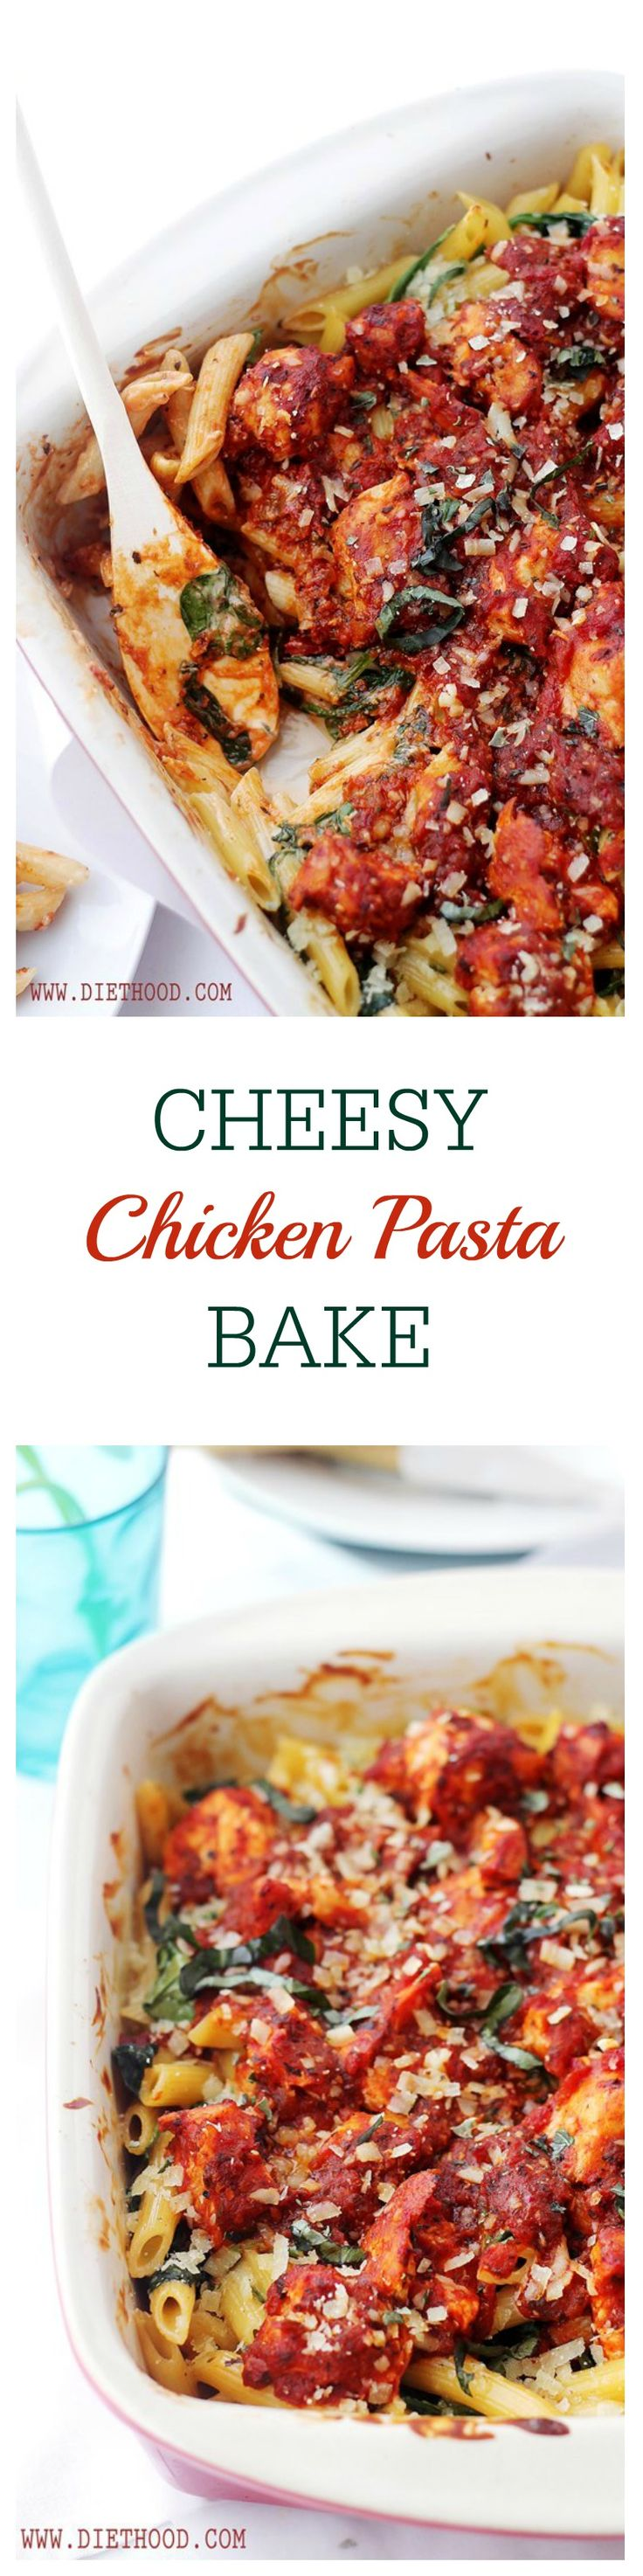 about Pasta Recipes on Pinterest | Shrimp pasta, Shrimp and Pasta